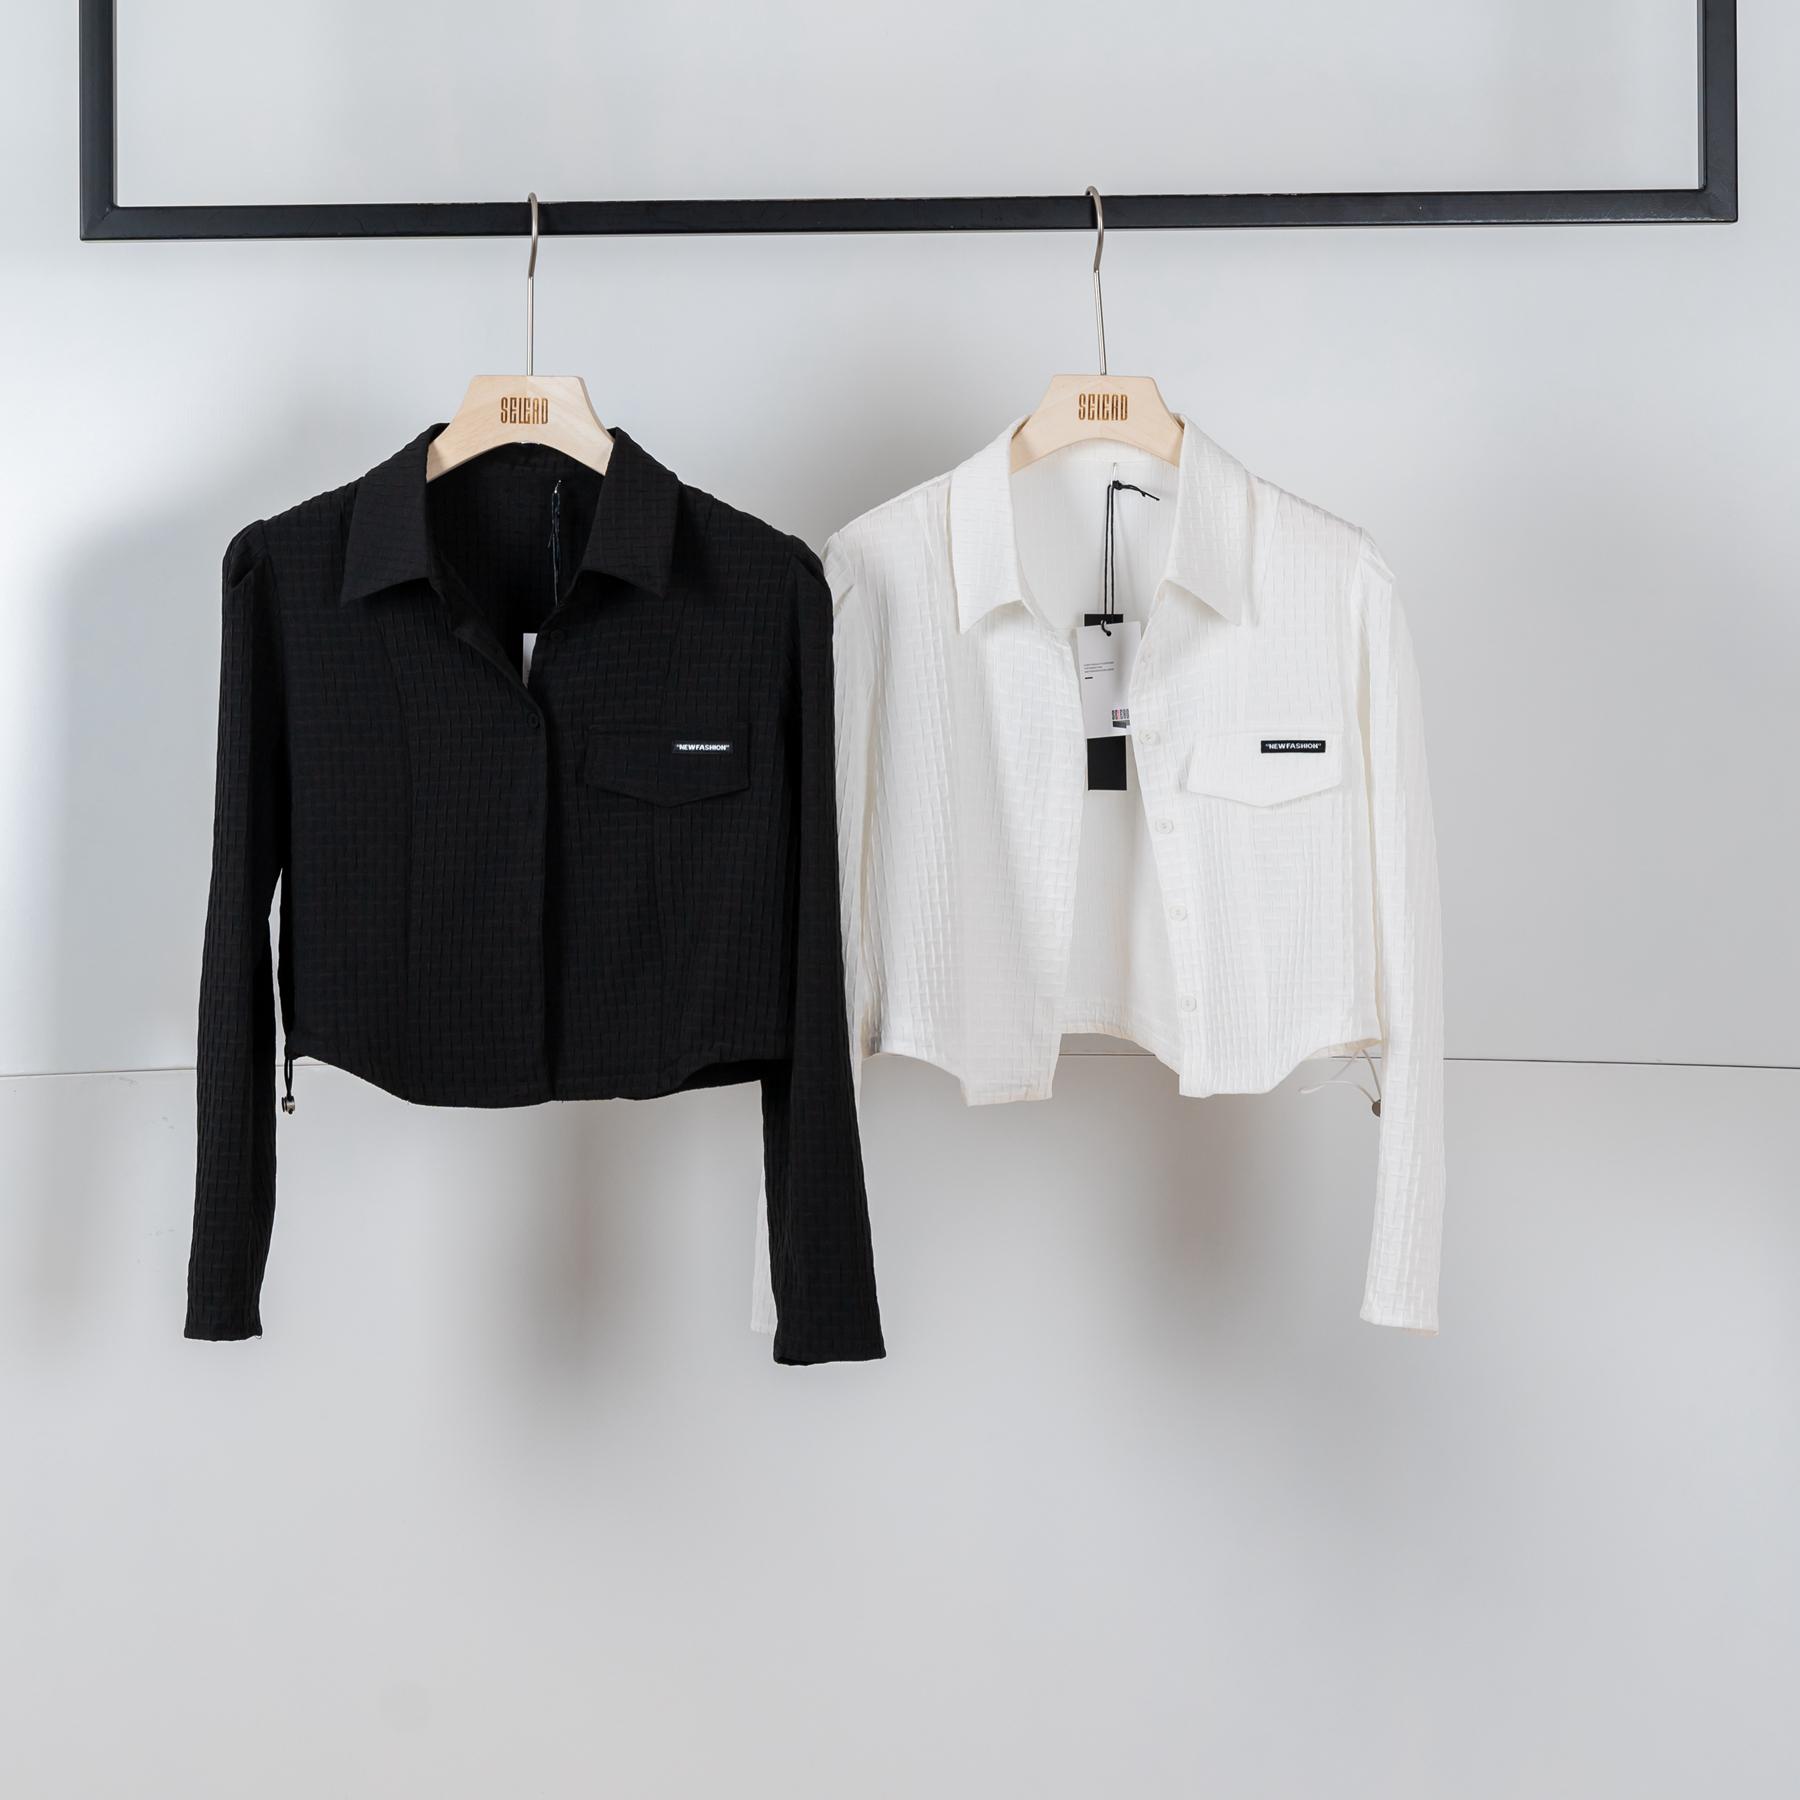 SELEAD欧美斑点设计感修身衬衫短外套Q1736CS